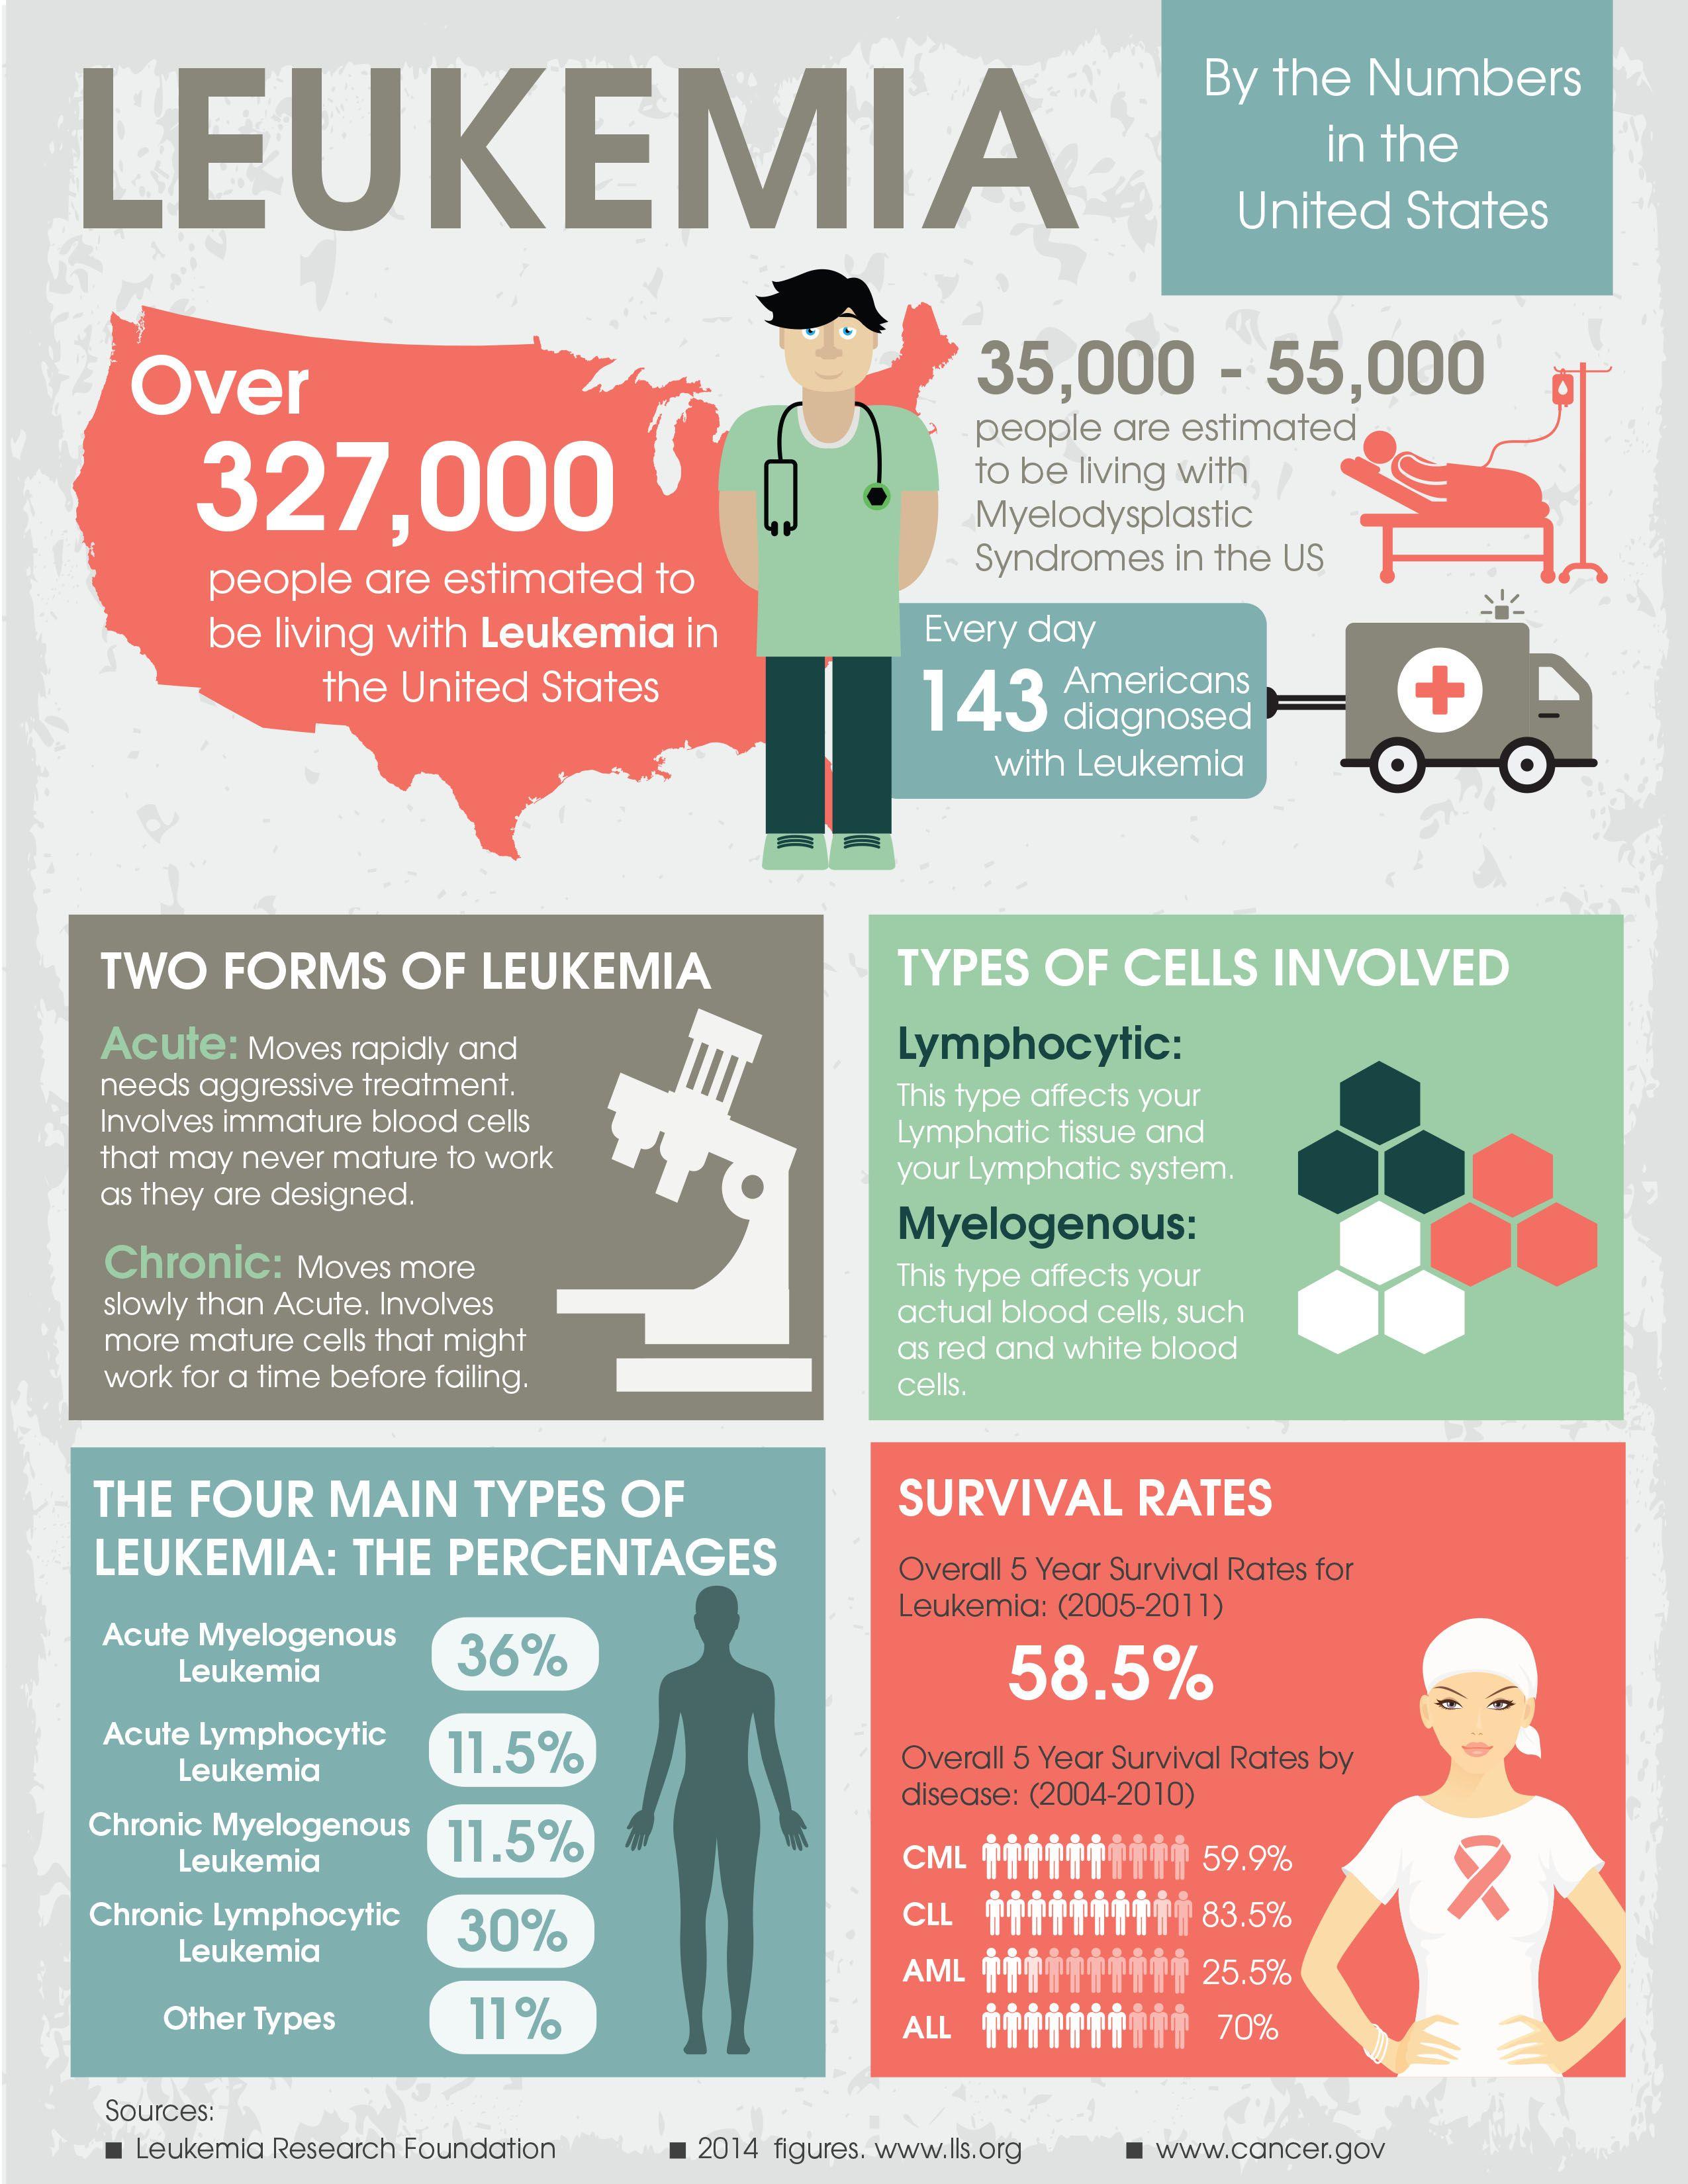 leukemia diagnosis and survival statistics | Leukemia